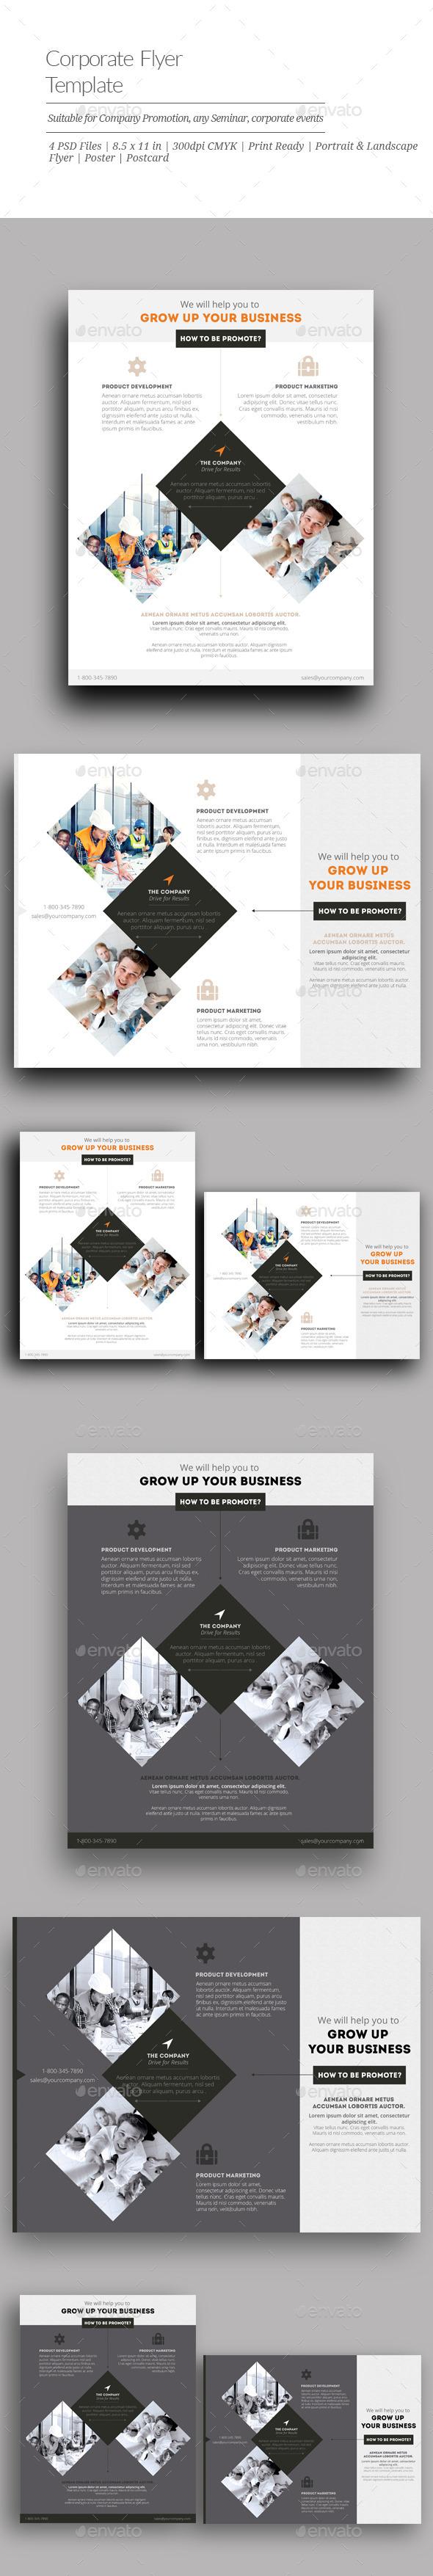 GraphicRiver Corporate Flyer Templates 10923506